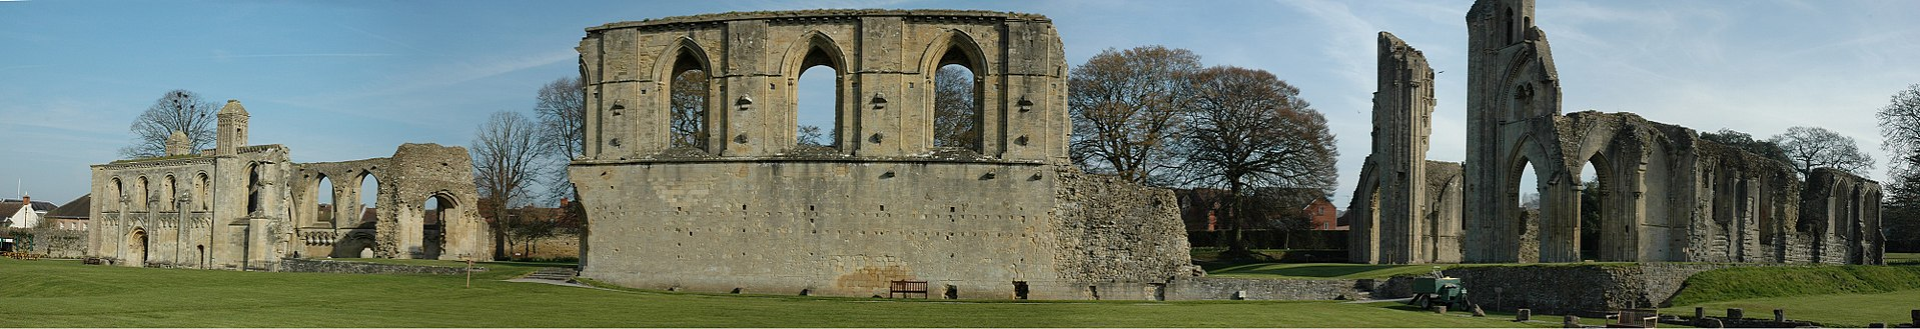 The Subterranean Secrets of Glastonbury Abbey Contributors Features